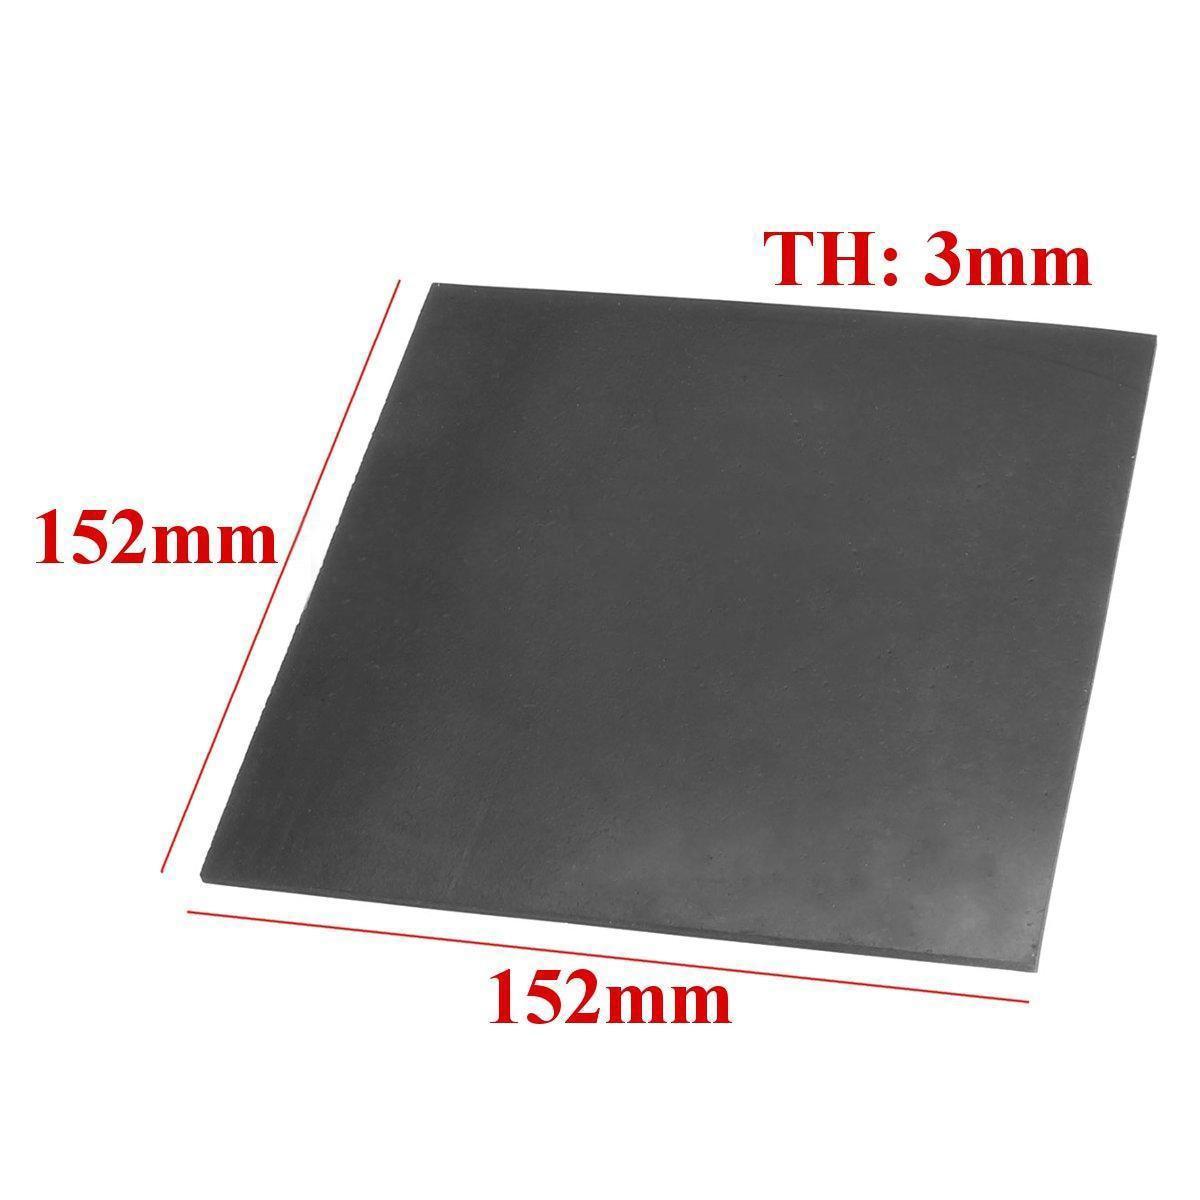 Placa de borracha de alta temperatura da resistência química da folha de borracha do revestimento liso preto 152*152*3mm mayitr de 1pc